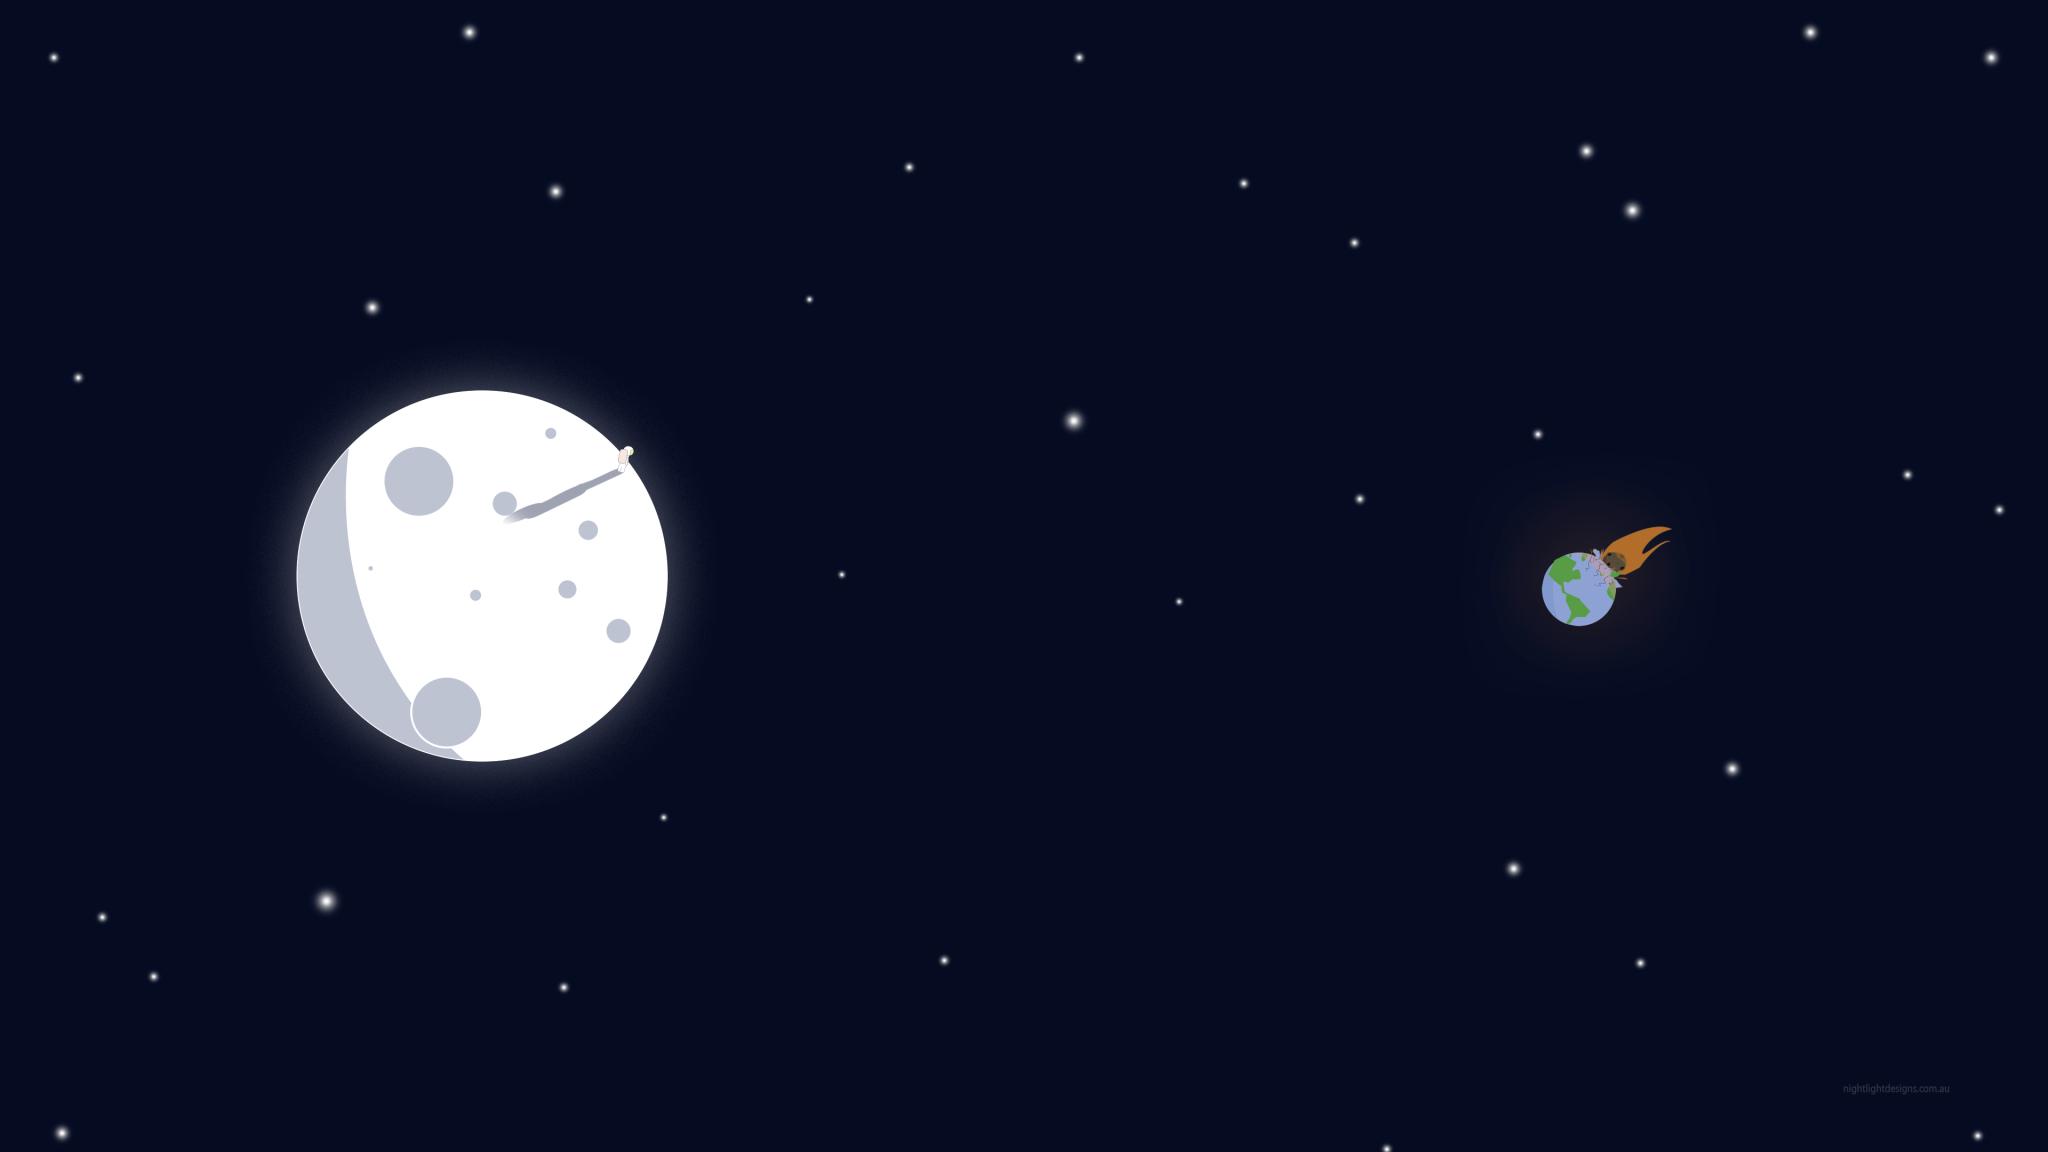 Space Moon And Earth Minimalism Art, HD 4K Wallpaper